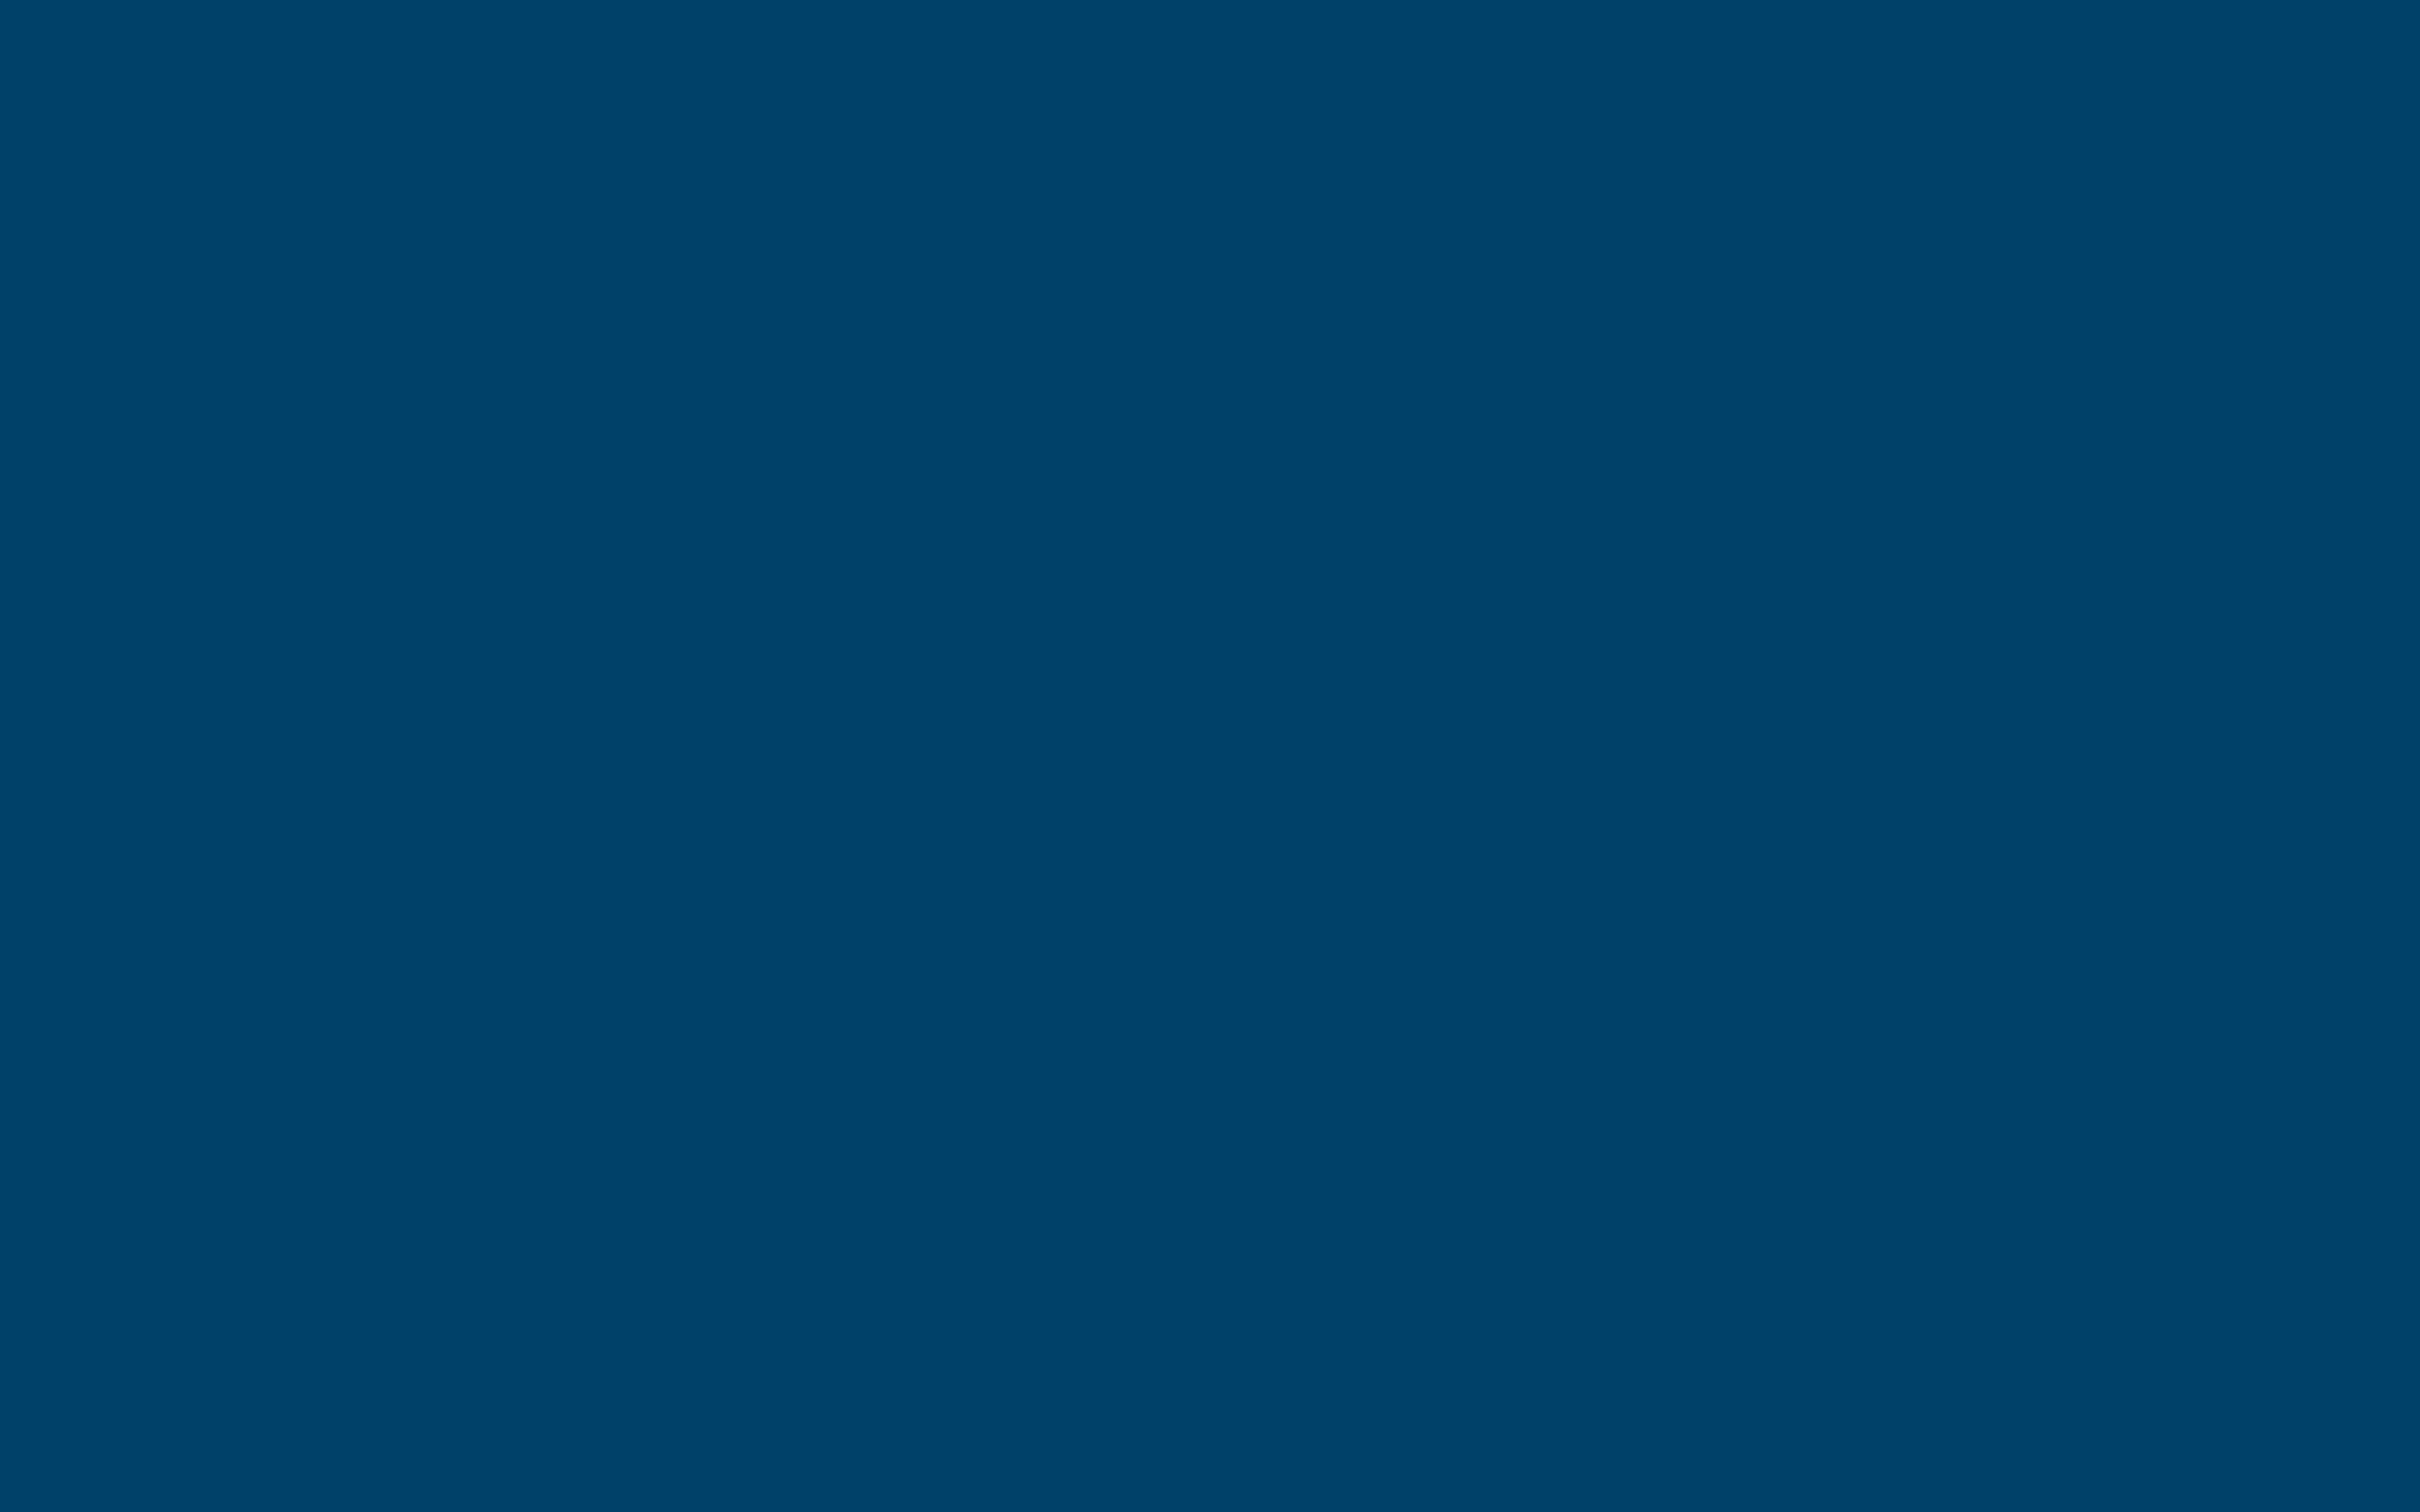 2560x1600 Indigo Dye Solid Color Background